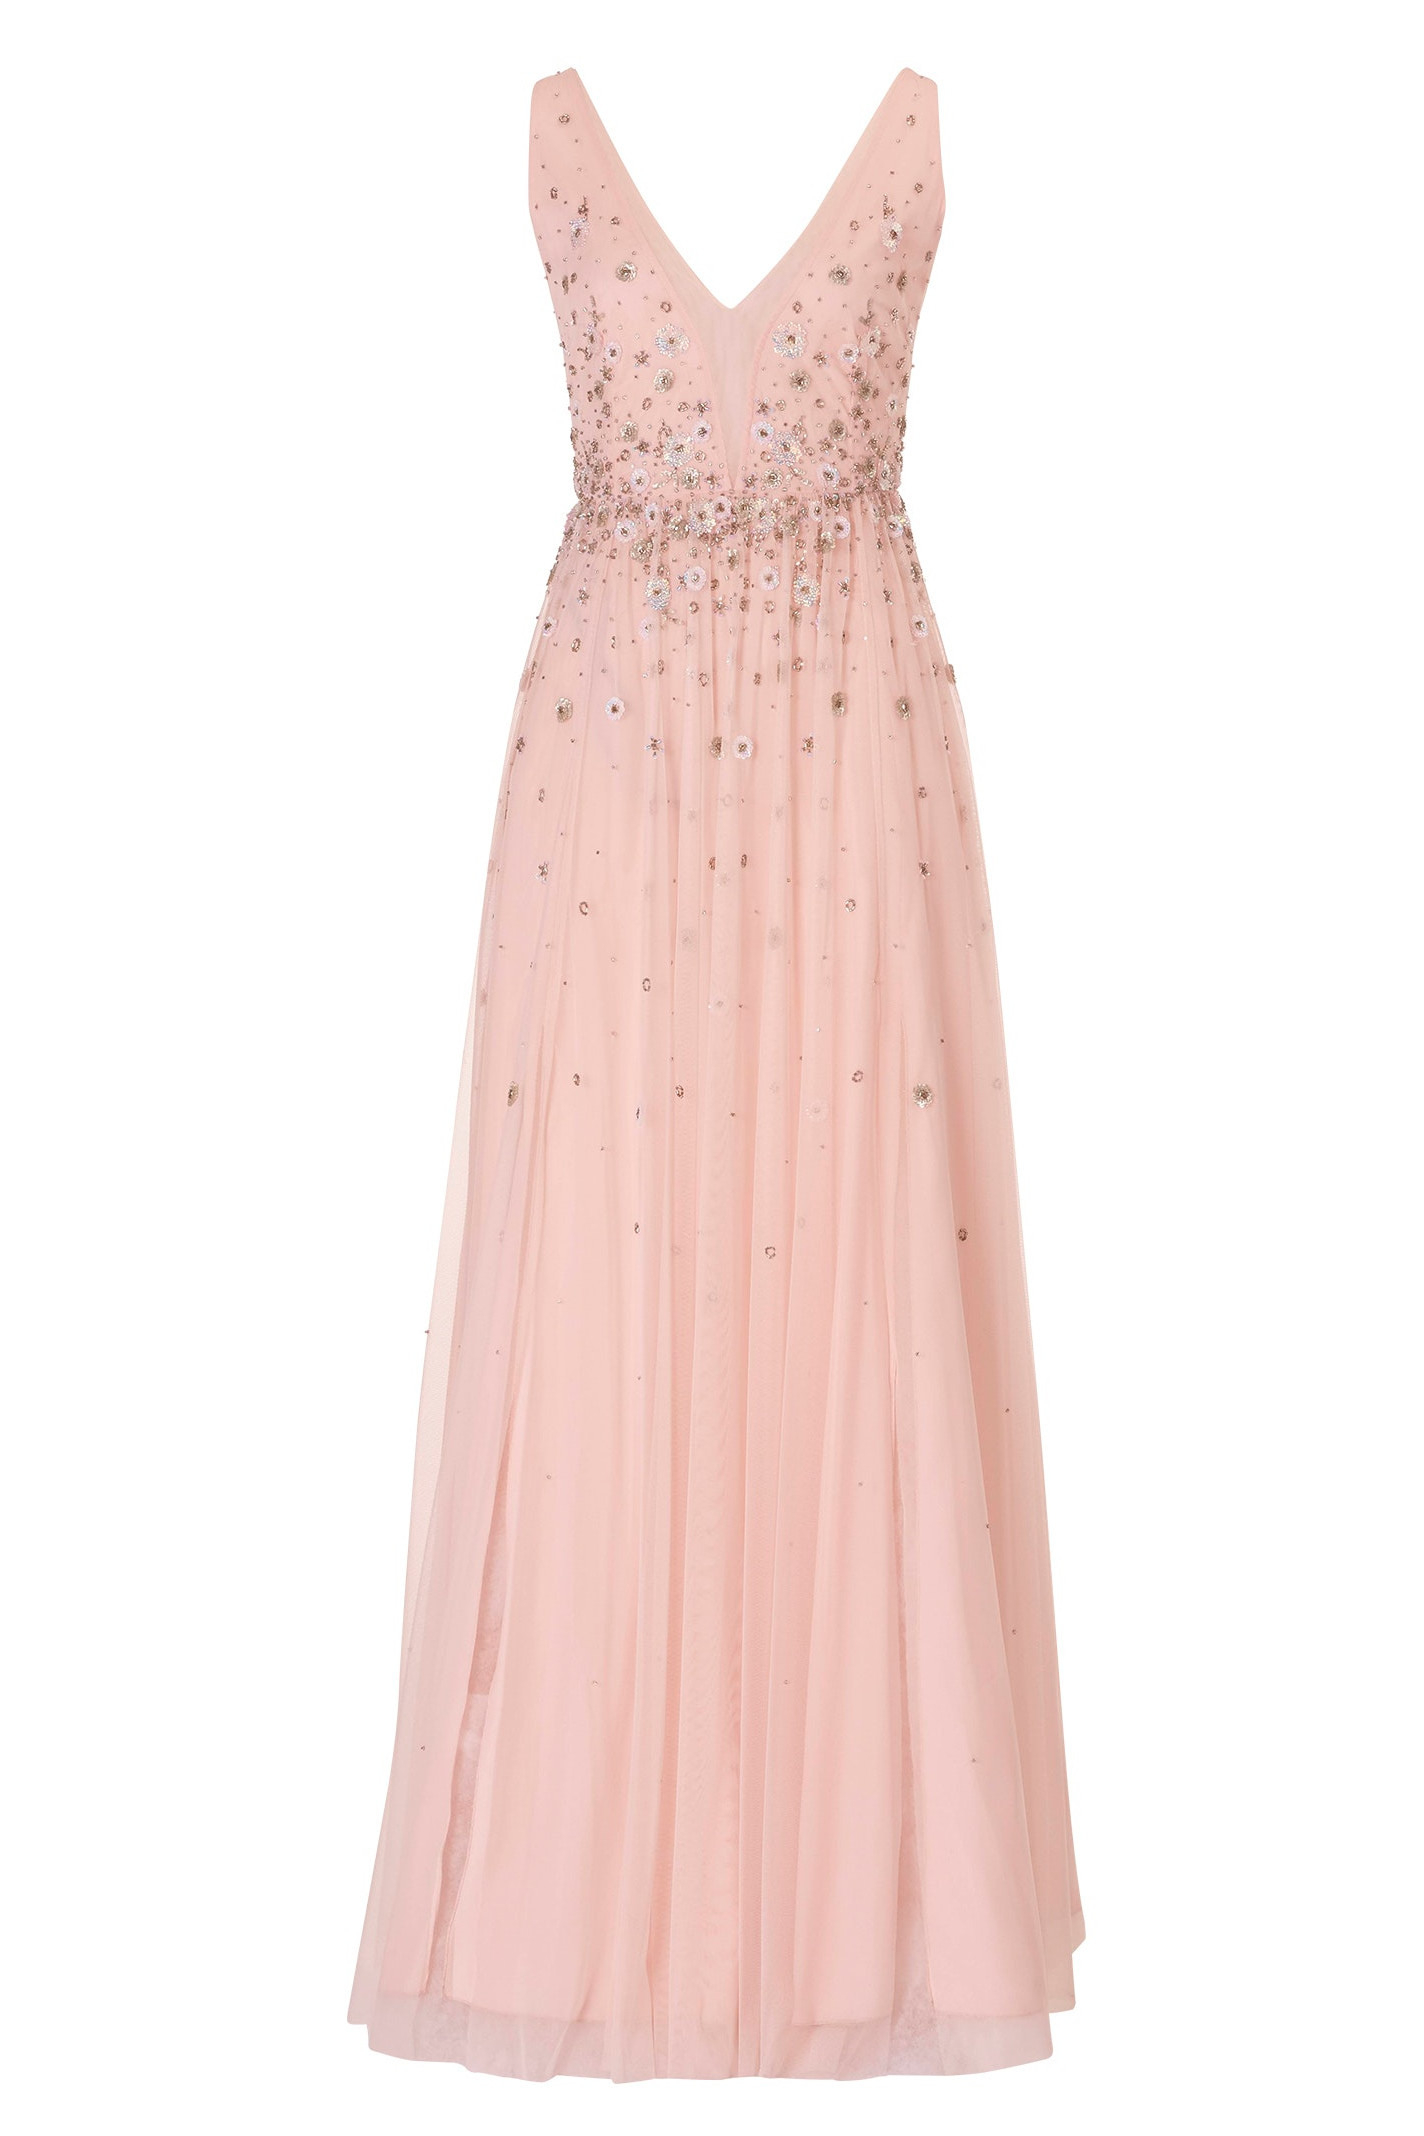 17 Genial Abend Kleid Rose Galerie20 Elegant Abend Kleid Rose für 2019